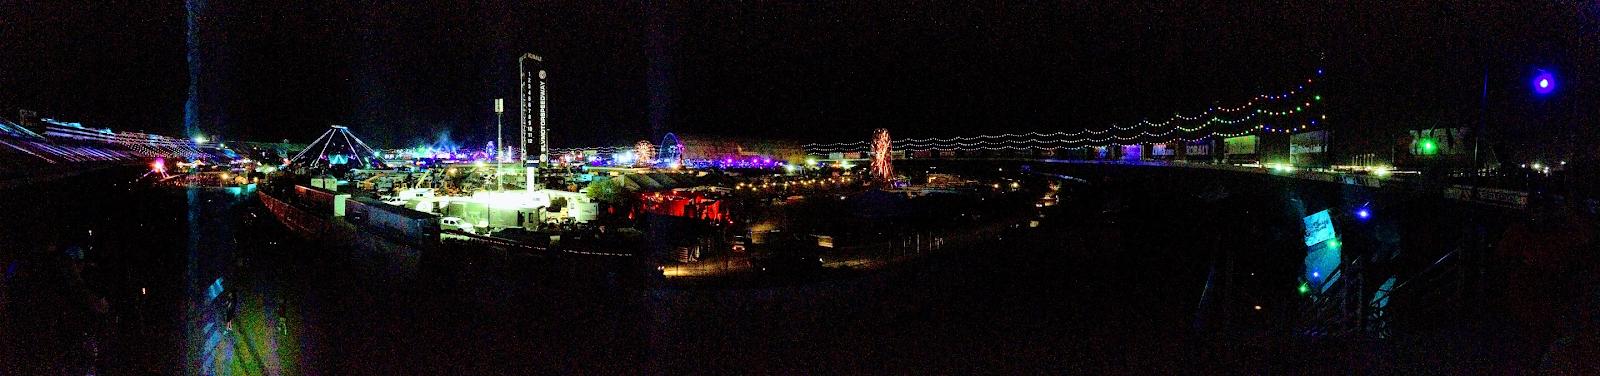 EDC Las Vegas Electric Sky PLUR music festival